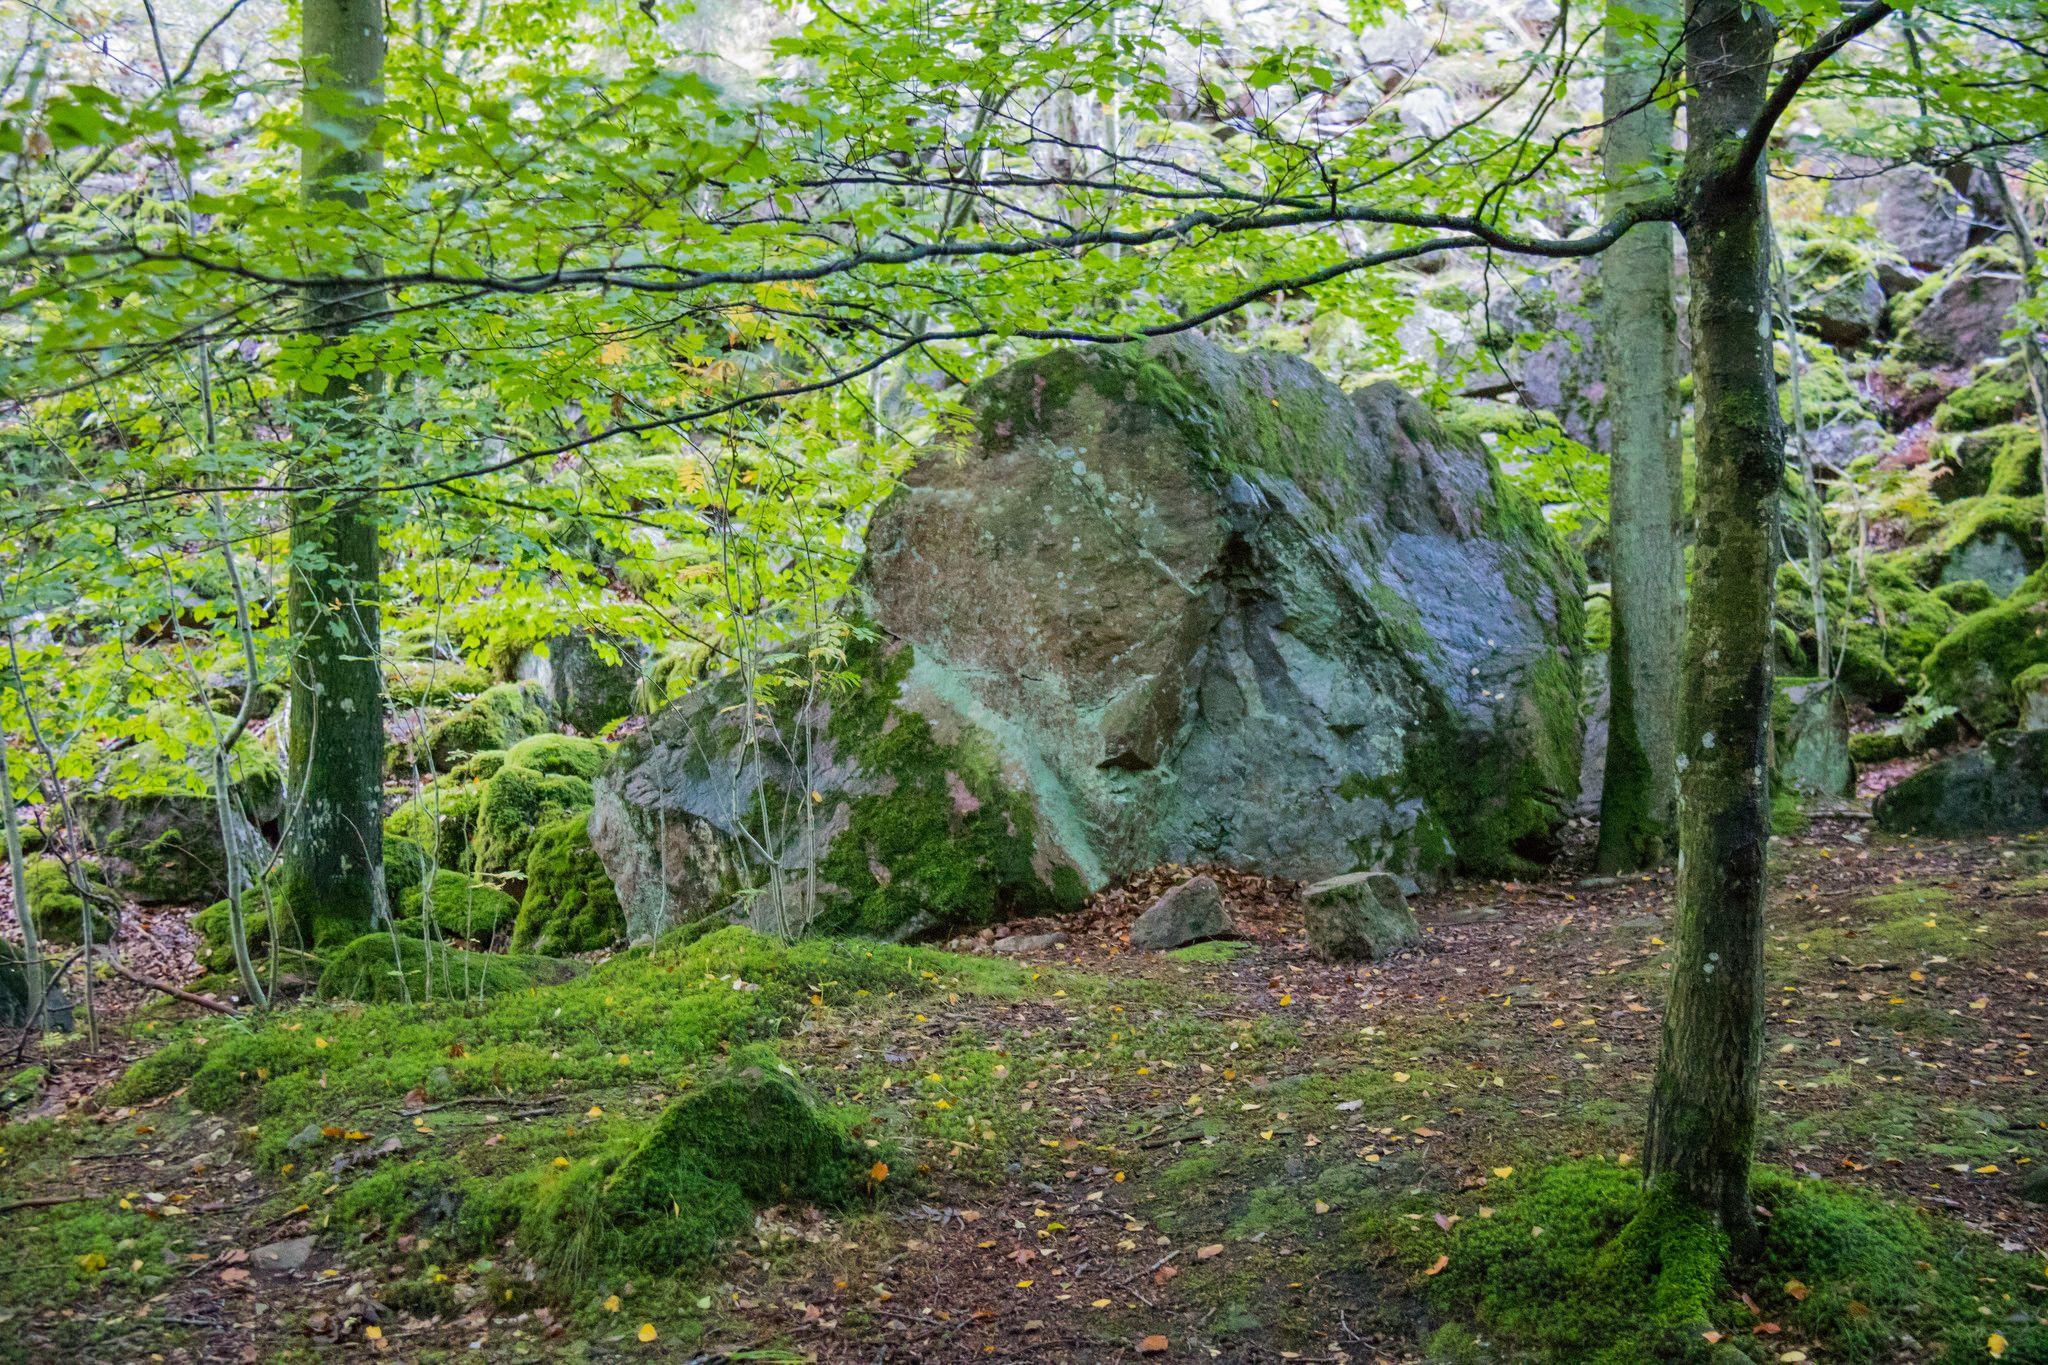 Rocks Woodland Plants Tree